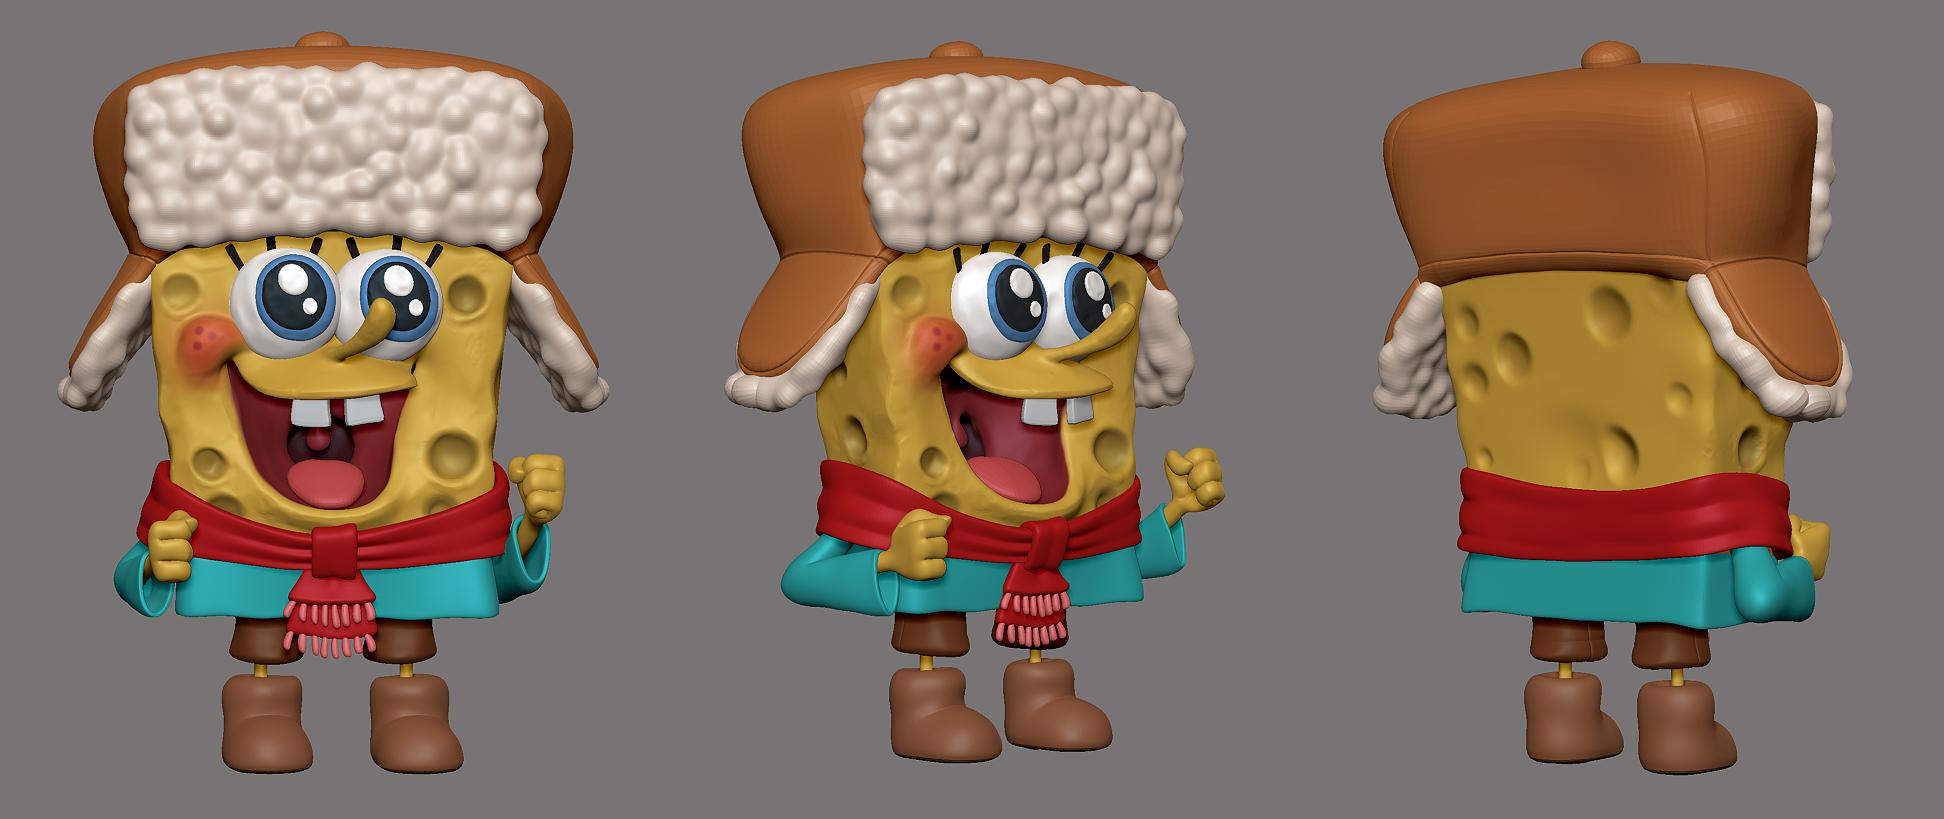 spongeBob3Dmodel.jpg